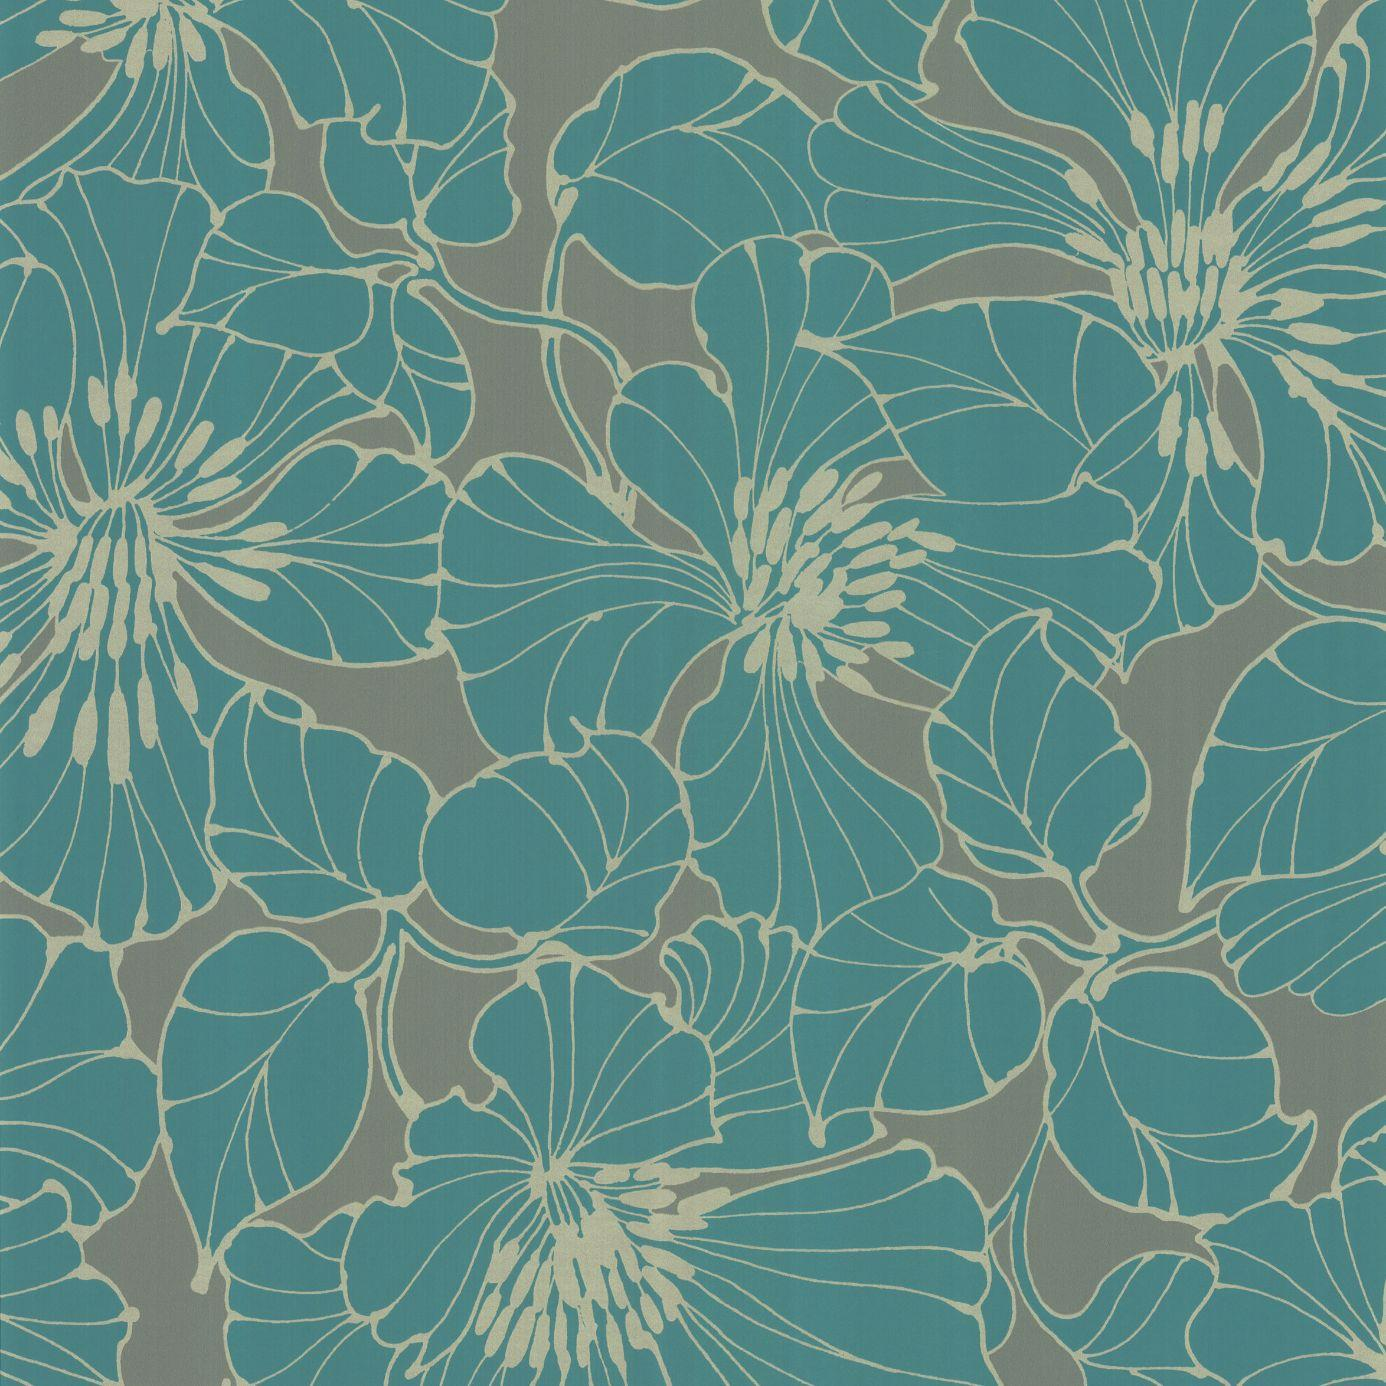 Turquoise and silver wallpaper wallpapersafari - Turquoise wallpaper pinterest ...